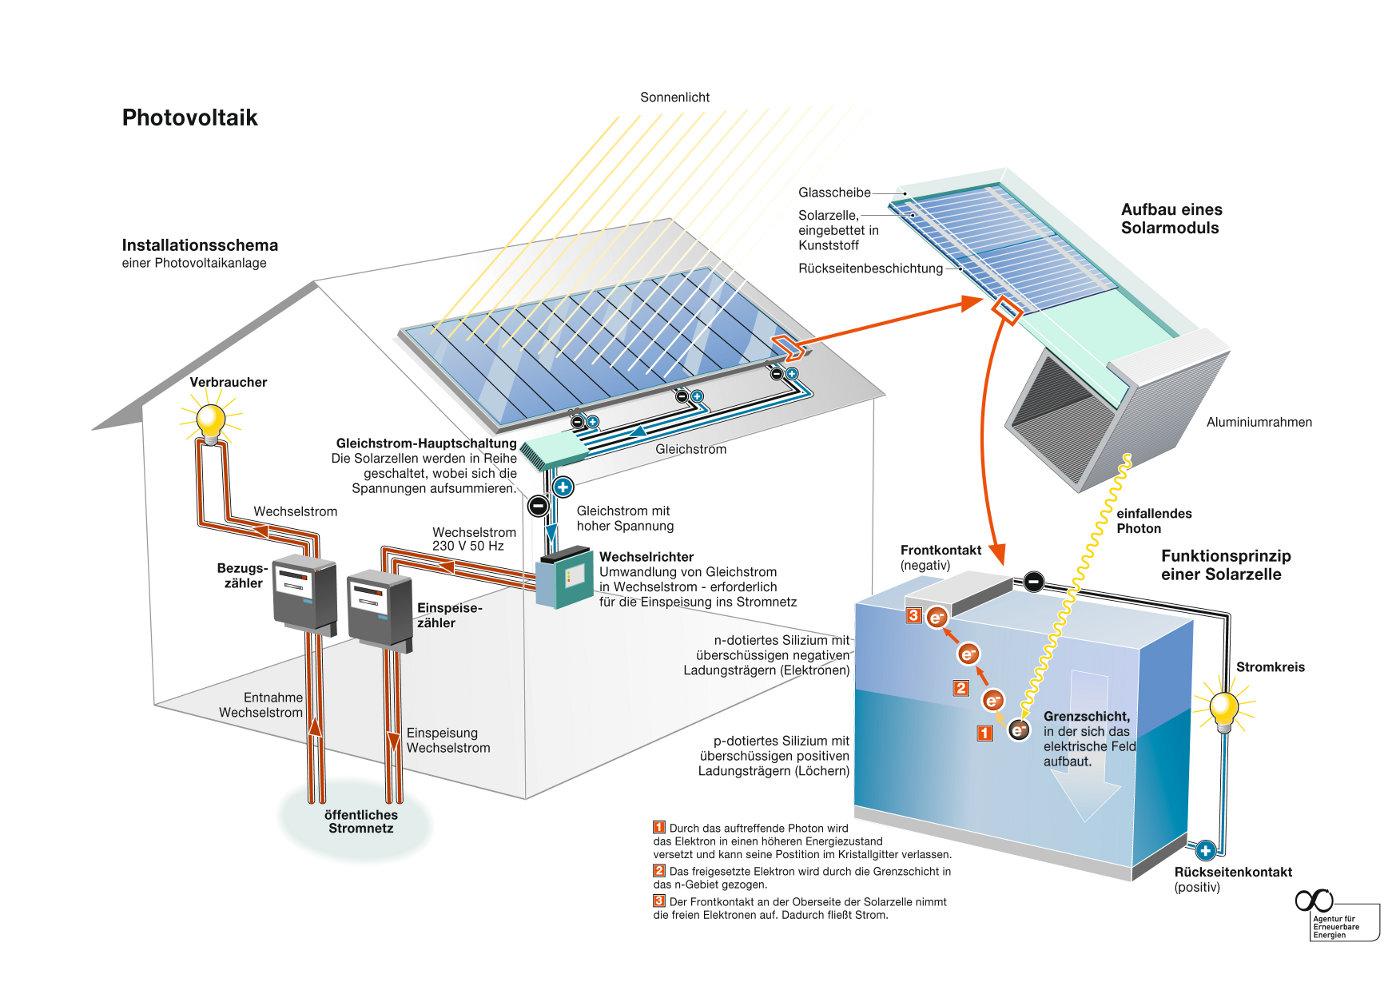 photovoltaik technik solarzellen module f r solaranlagen